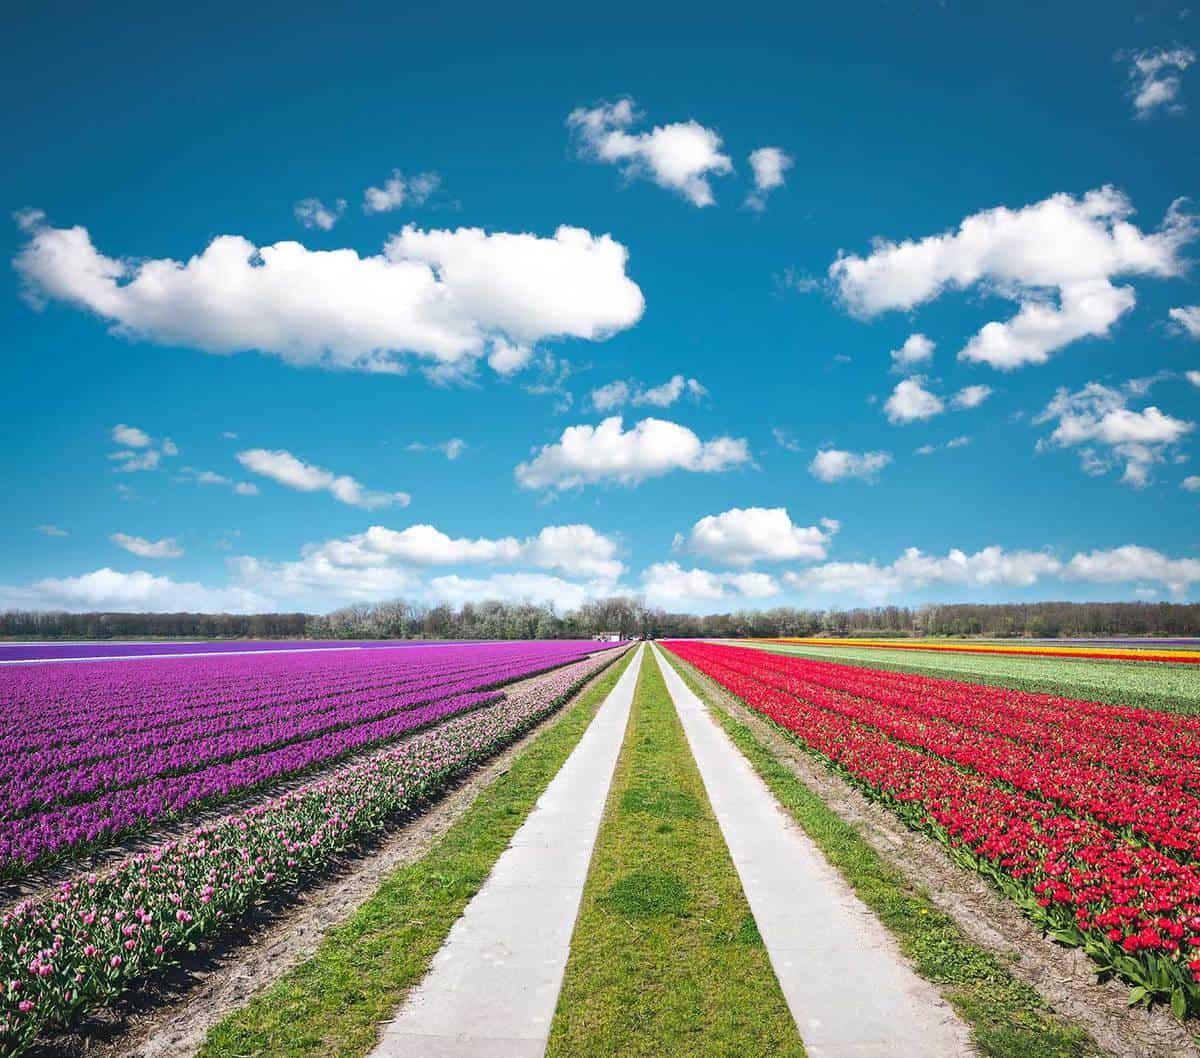 Road through colorful tulip field